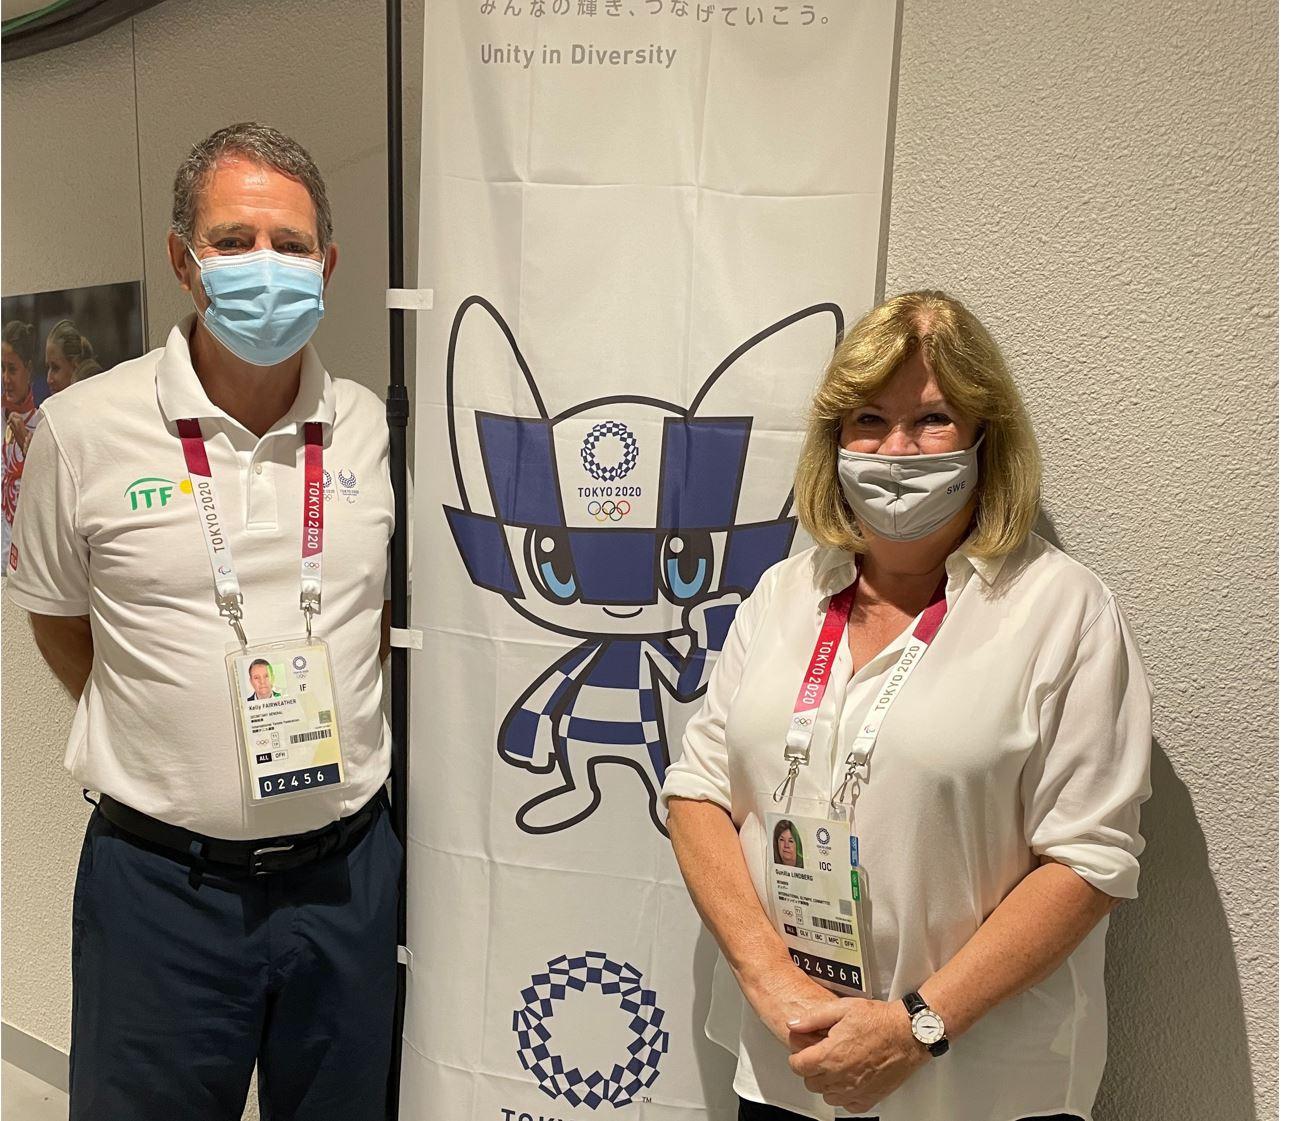 Gunilla Lindberg, right, also met with International Tennis Federation President Kelly Fairweather at Tokyo 2020 ©ANOC